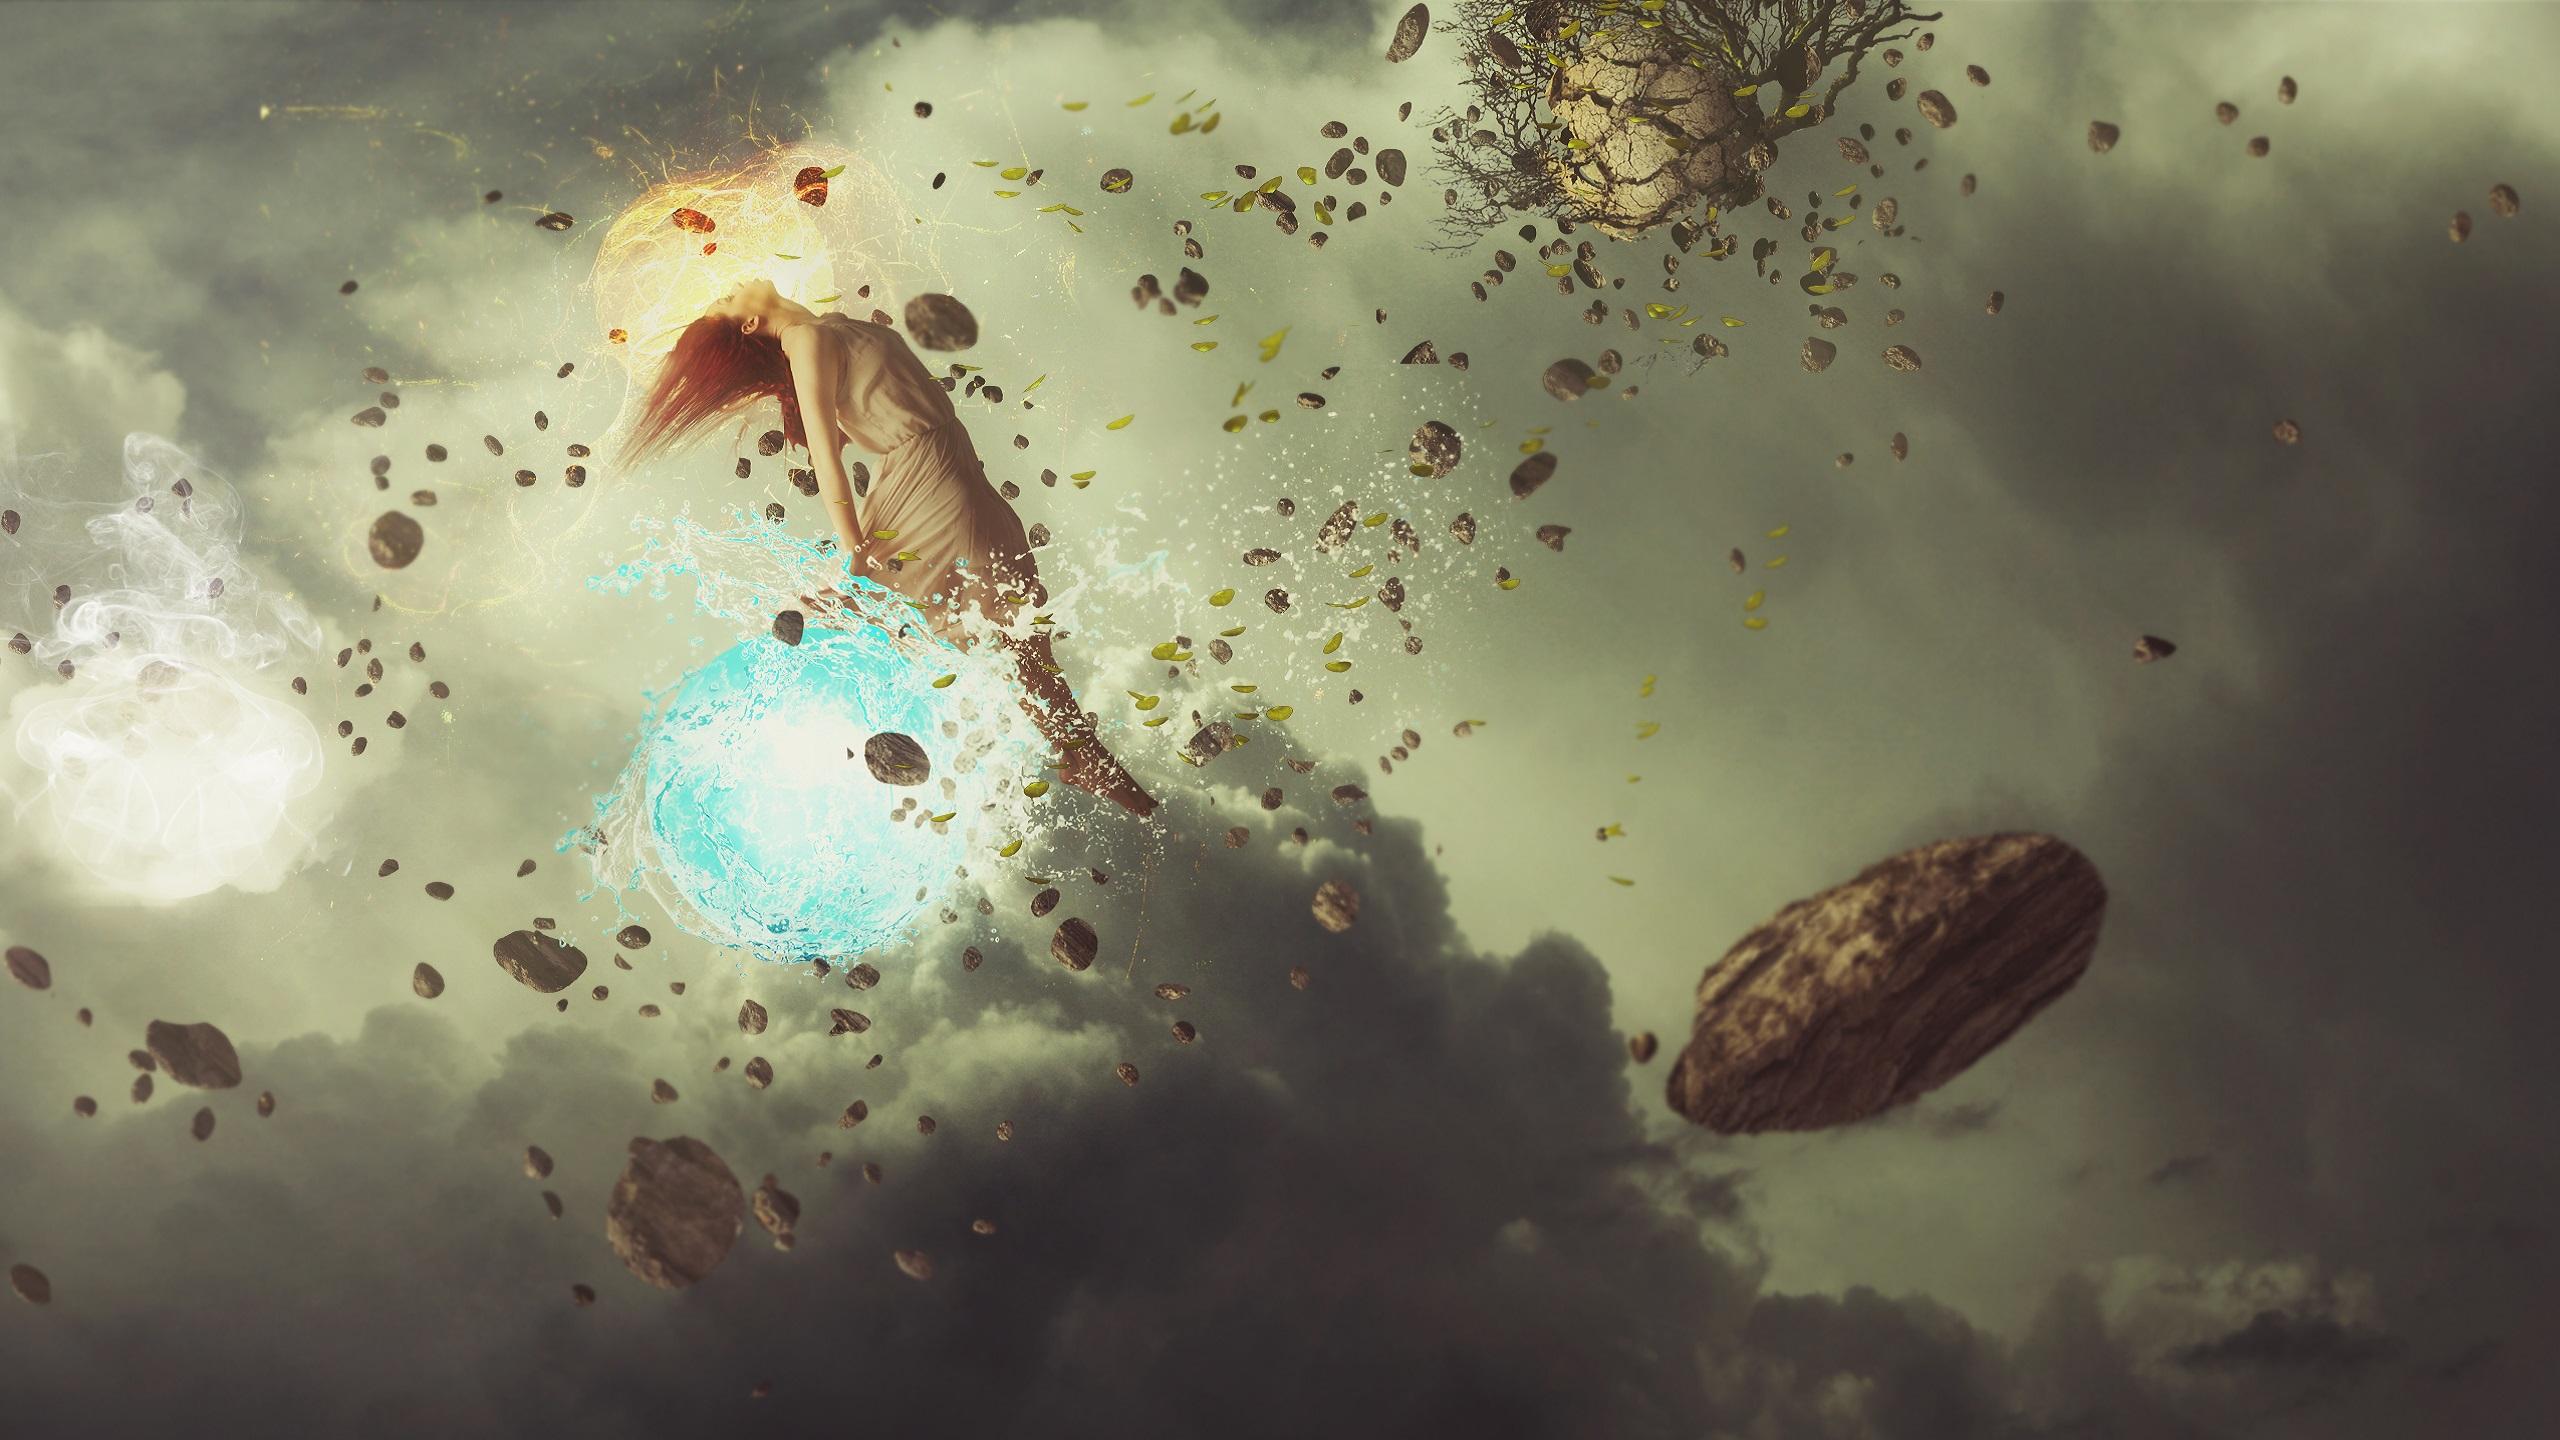 Elemental Fantasy Landscape Manipulation Woman 2560x1440